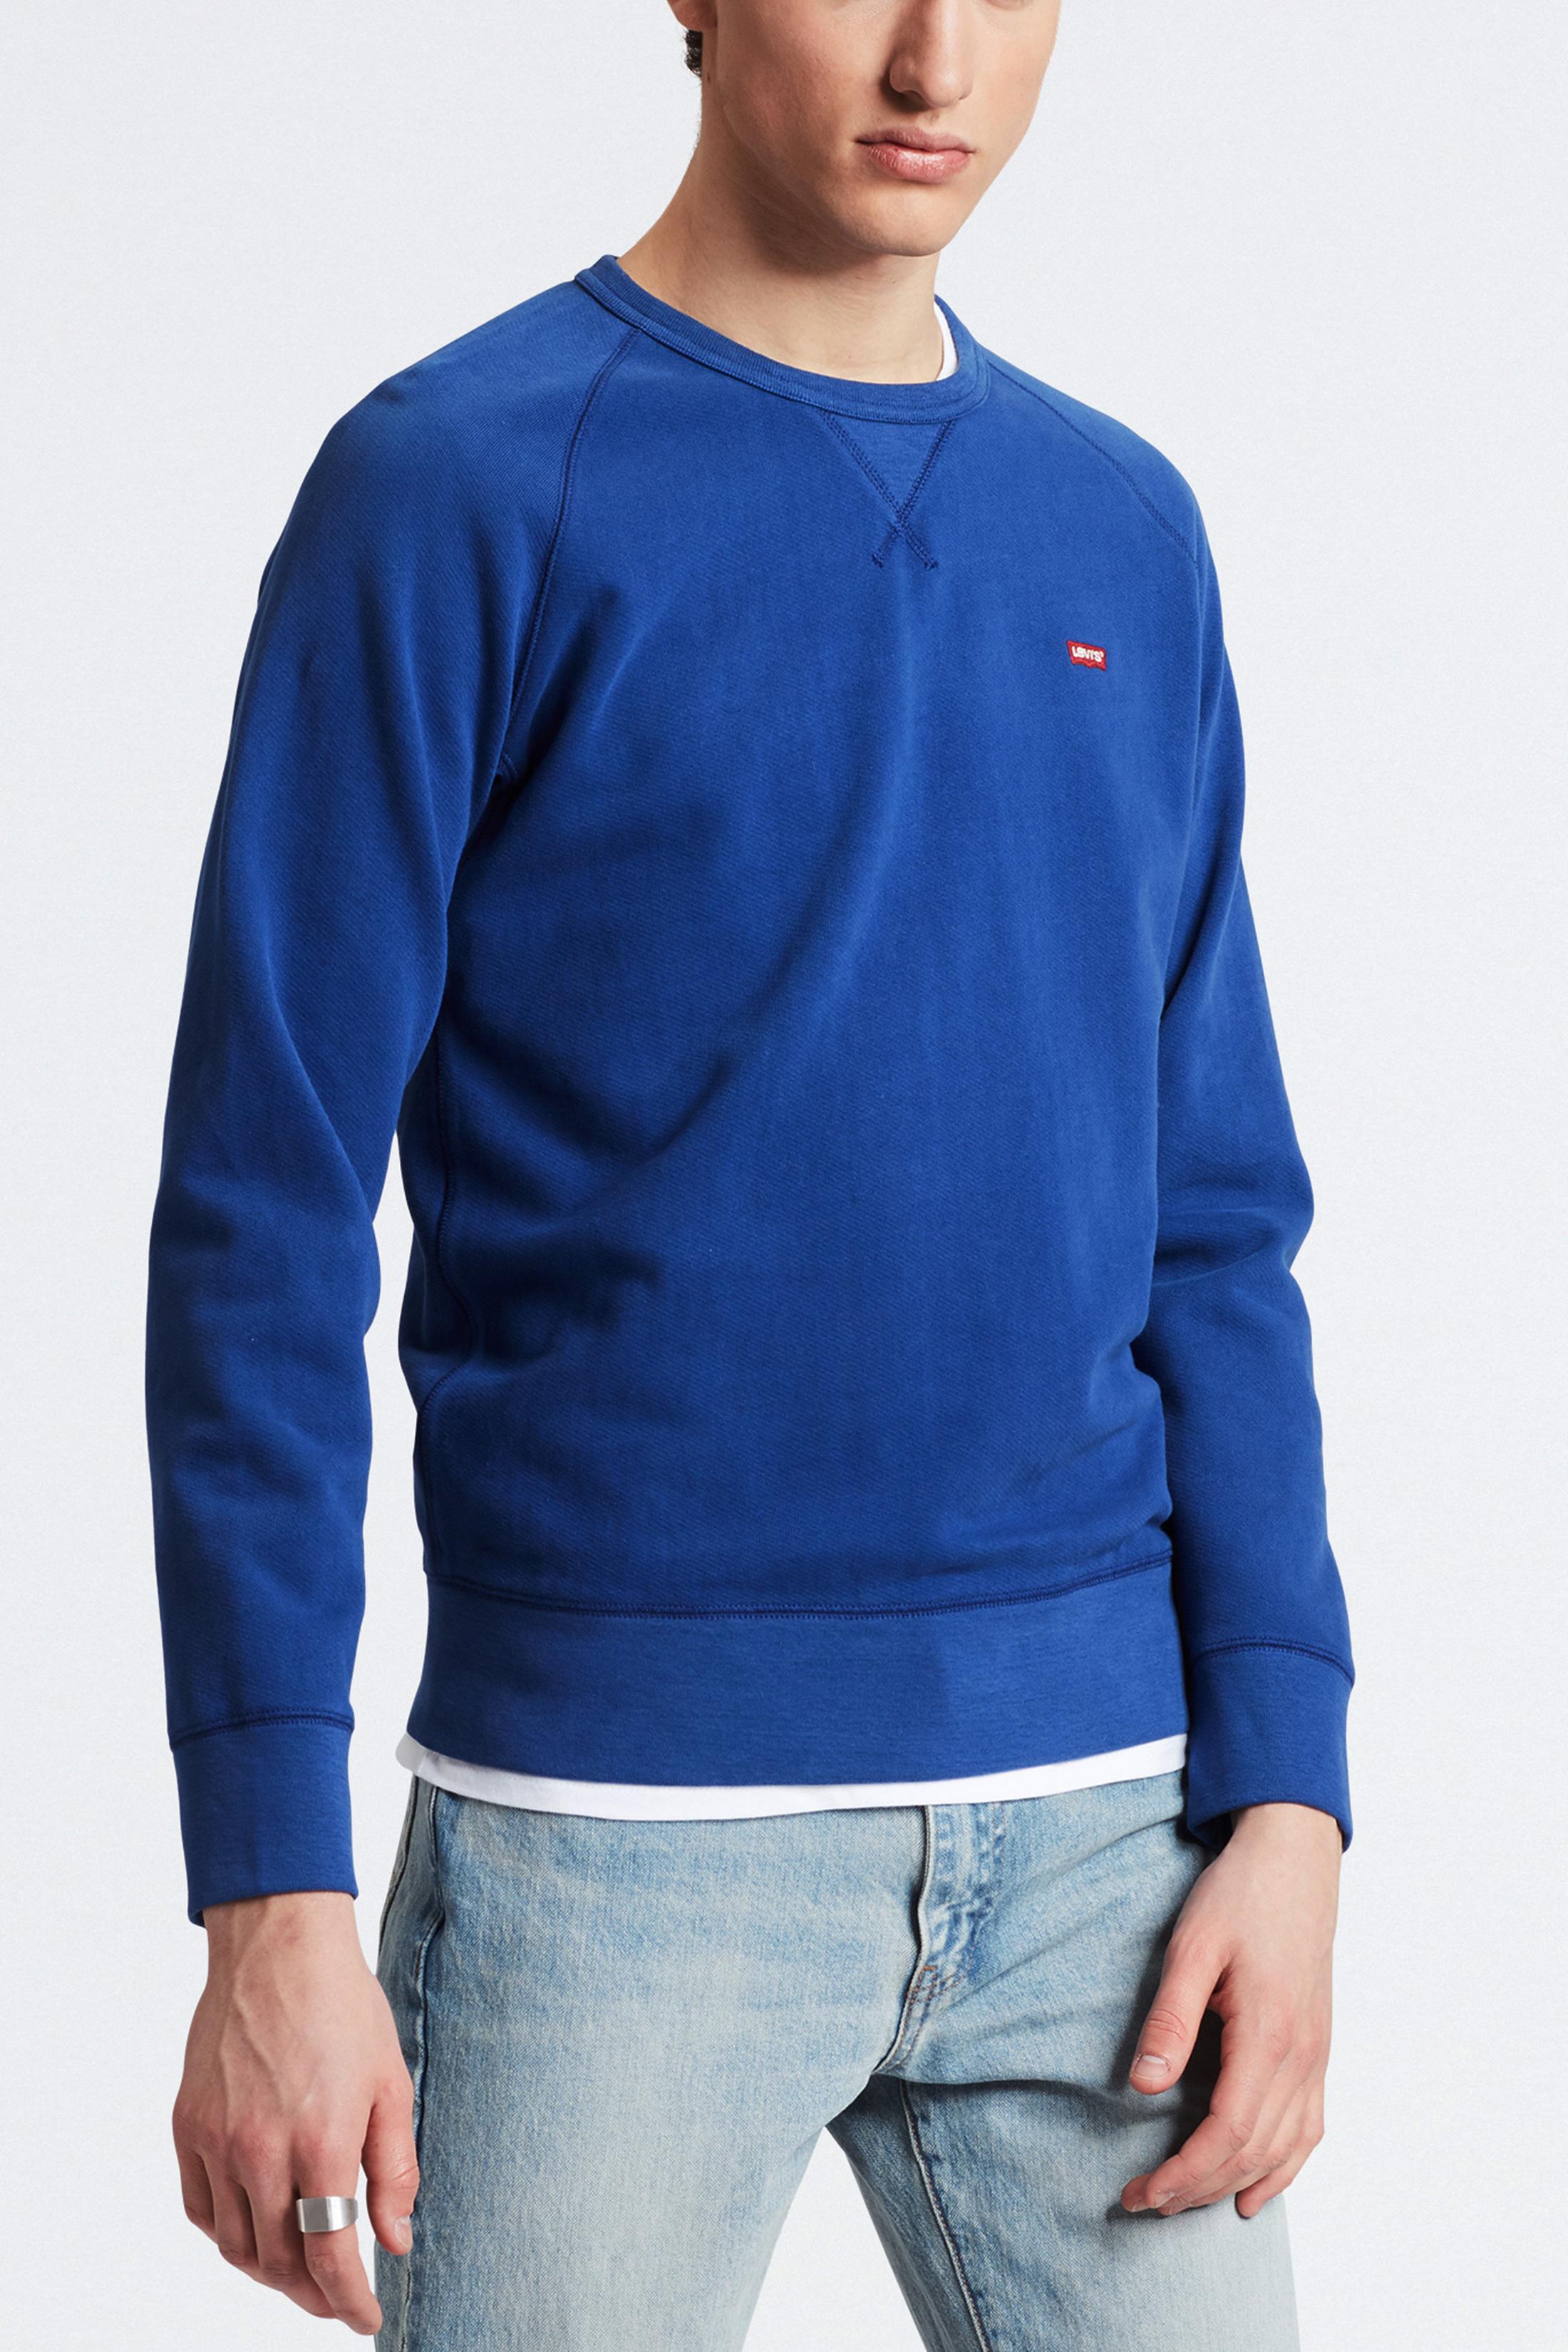 Levi's Original Sweater Indigo Blue photo 4